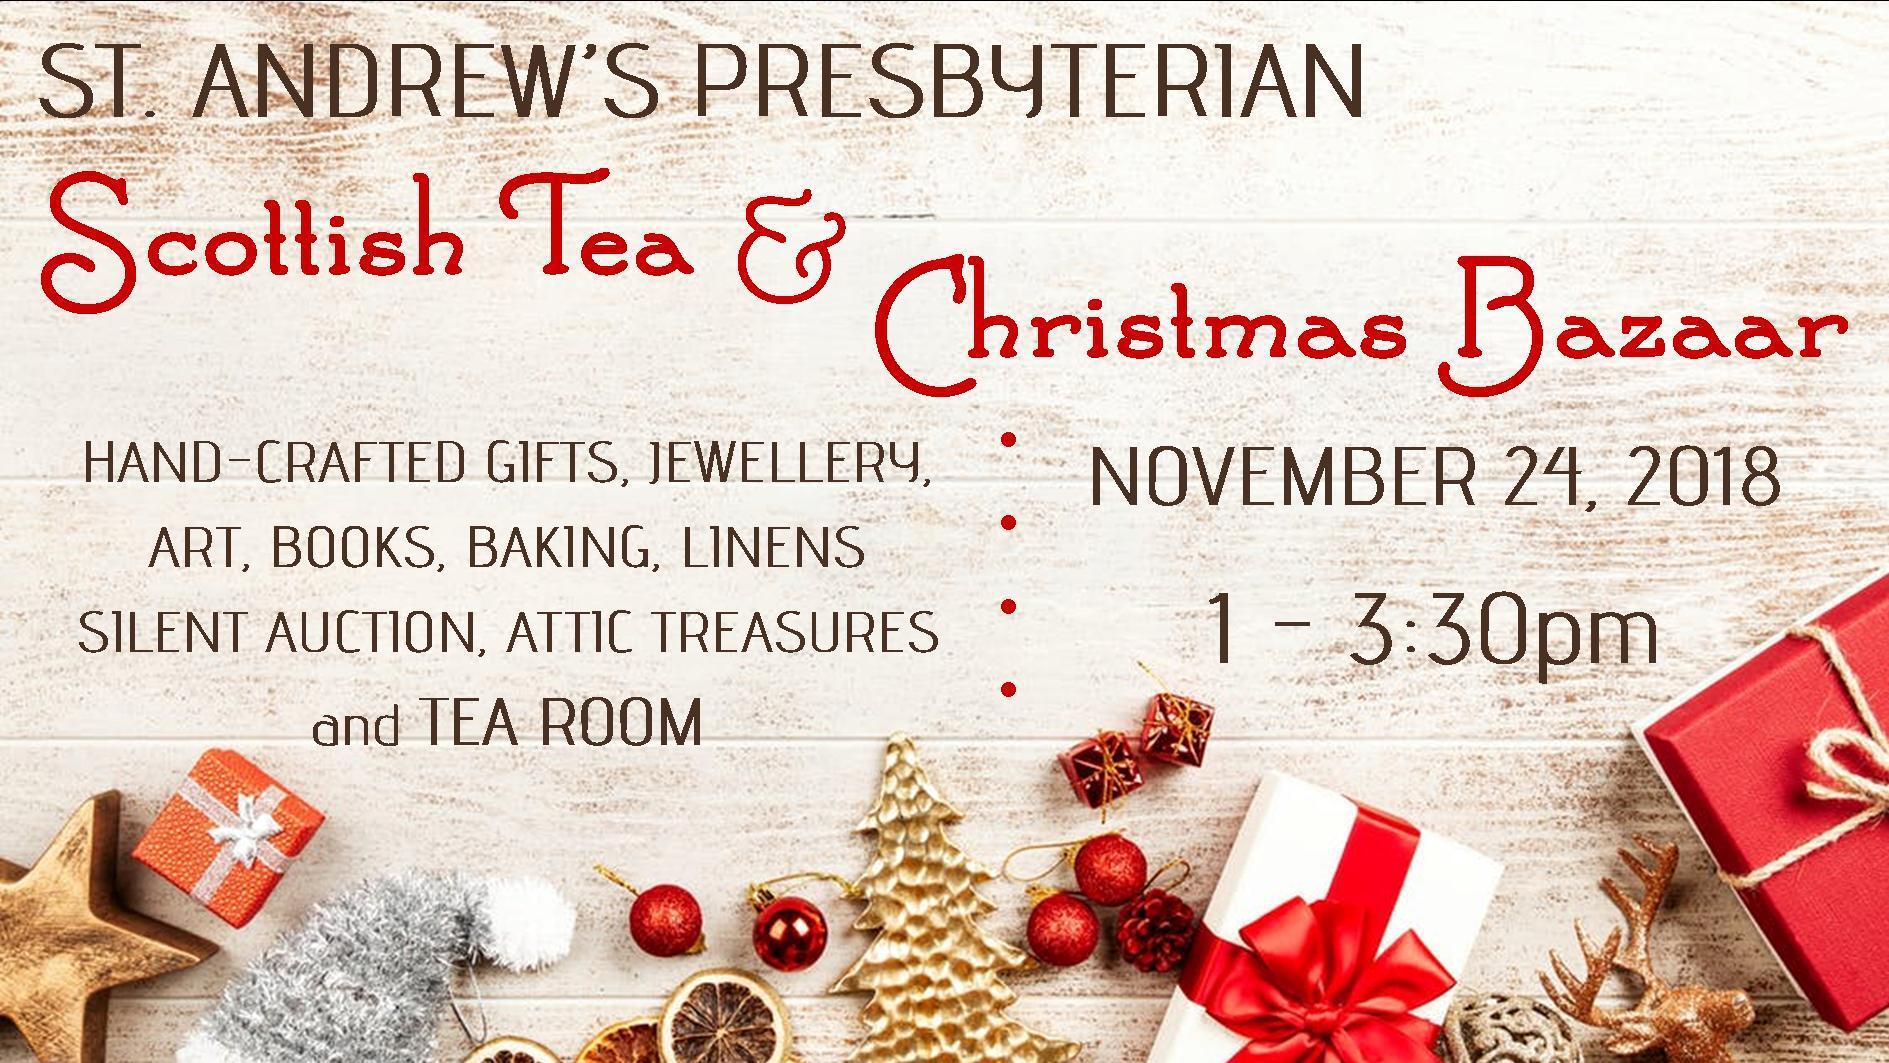 Ottawa Sun | Classifieds | Events | Scottish Tea & Christmas Bazaar ...